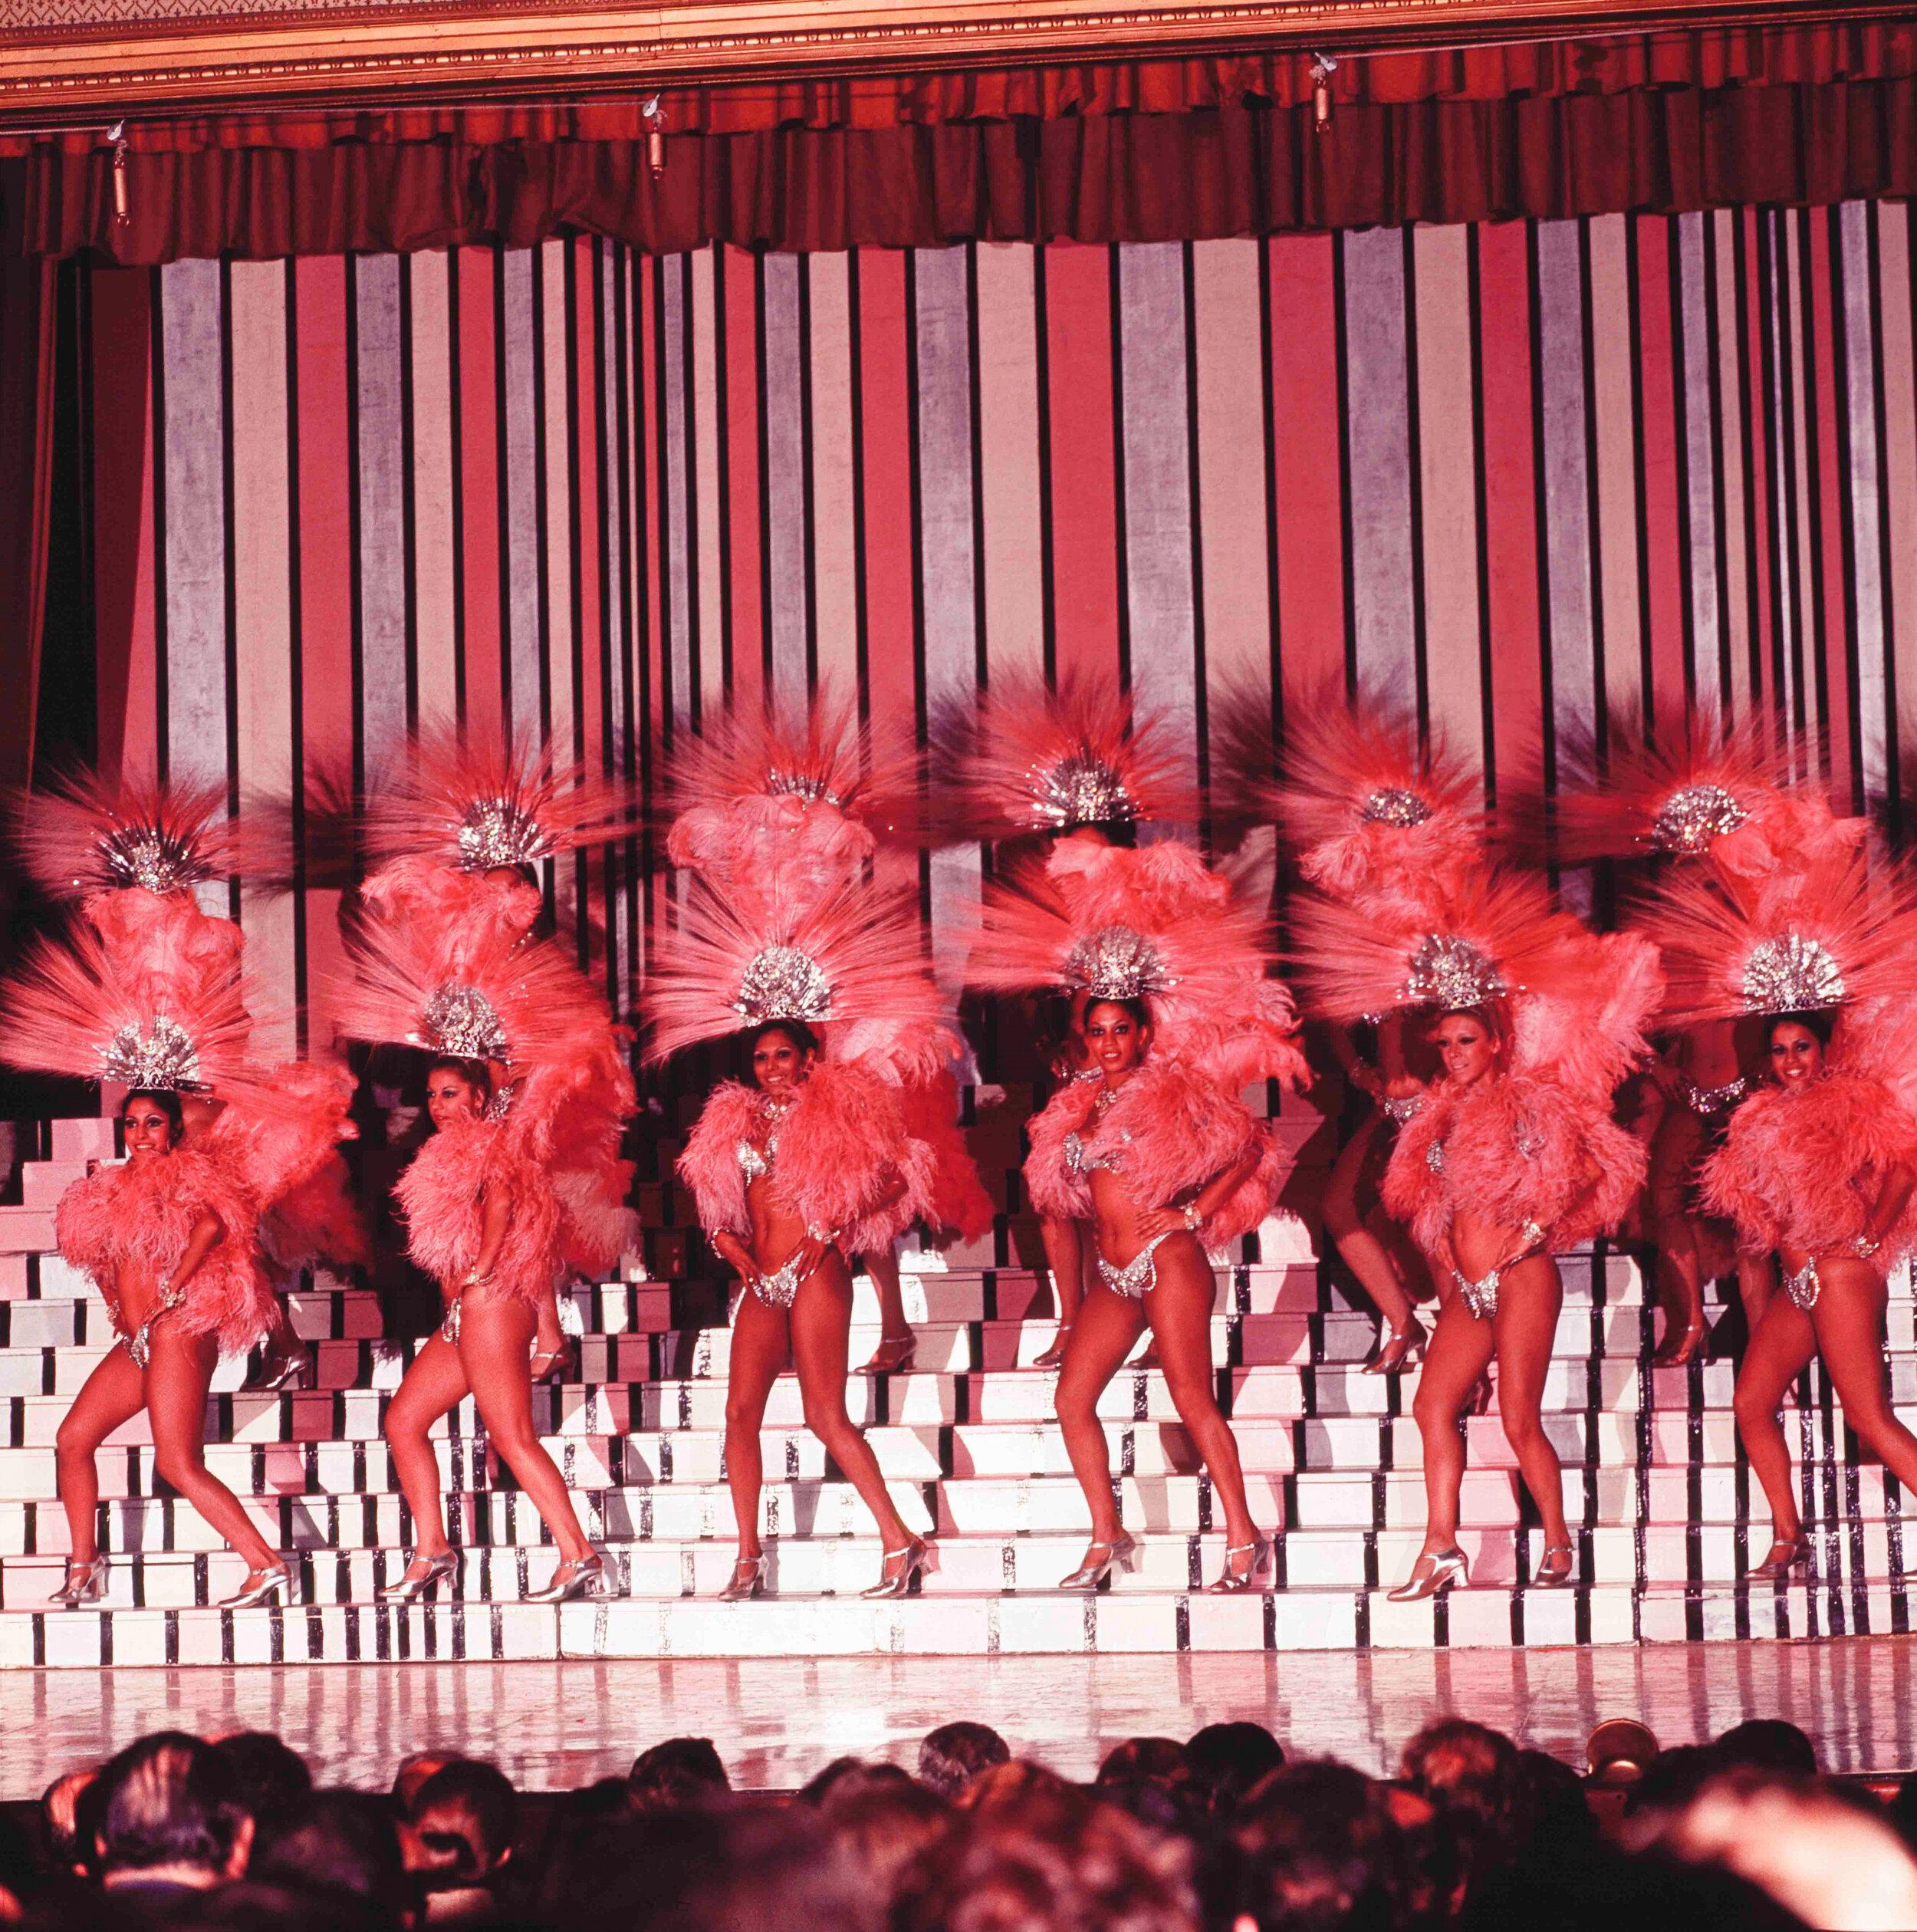 Argentine revue scene in the early 1970s - image from the Foto Estudio Luisita archive